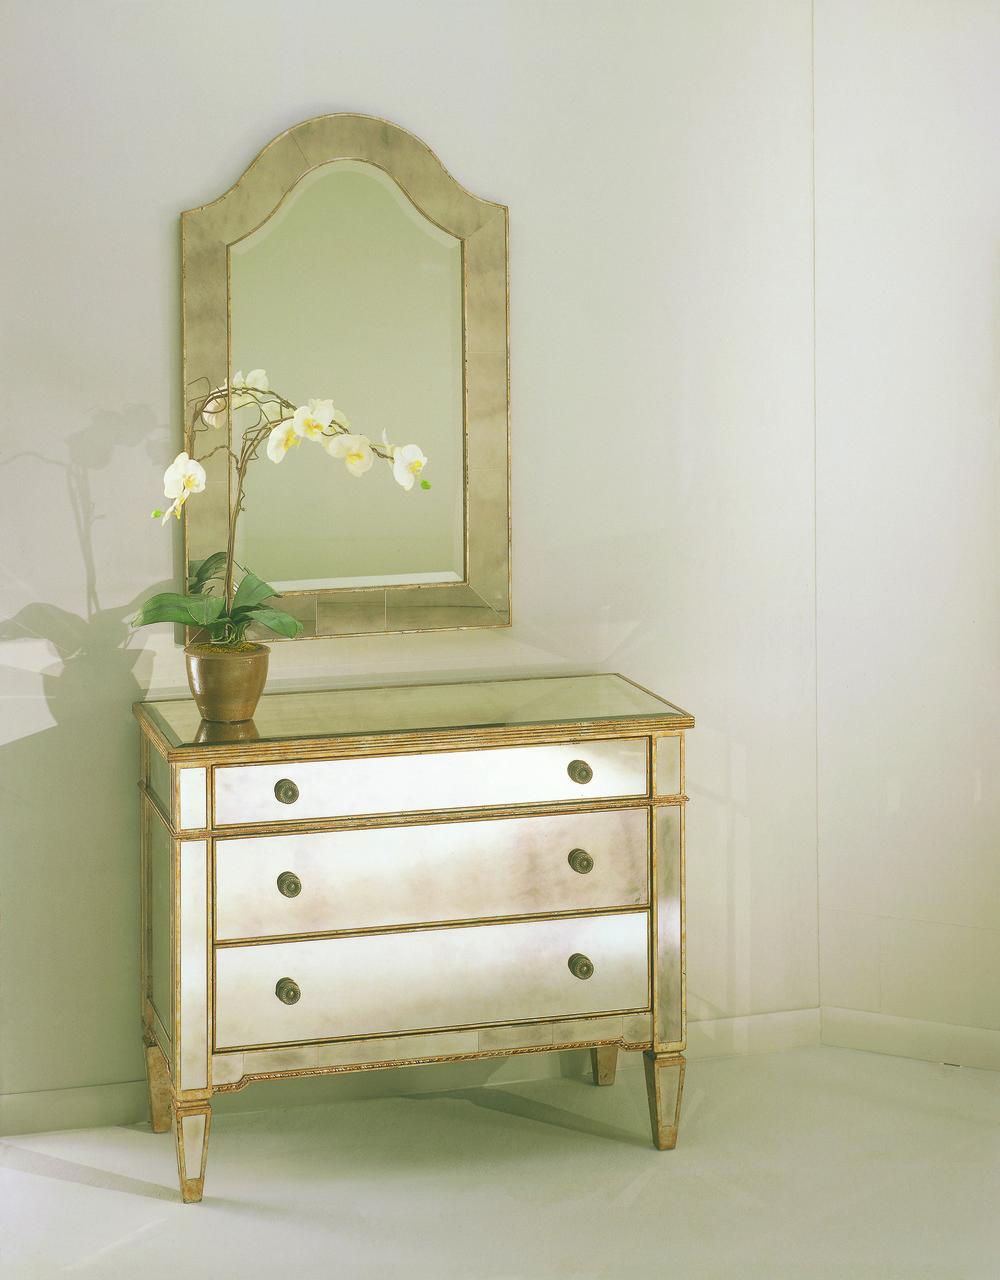 Bassett Mirror Company - Borghese Three Drawer Hall Chest